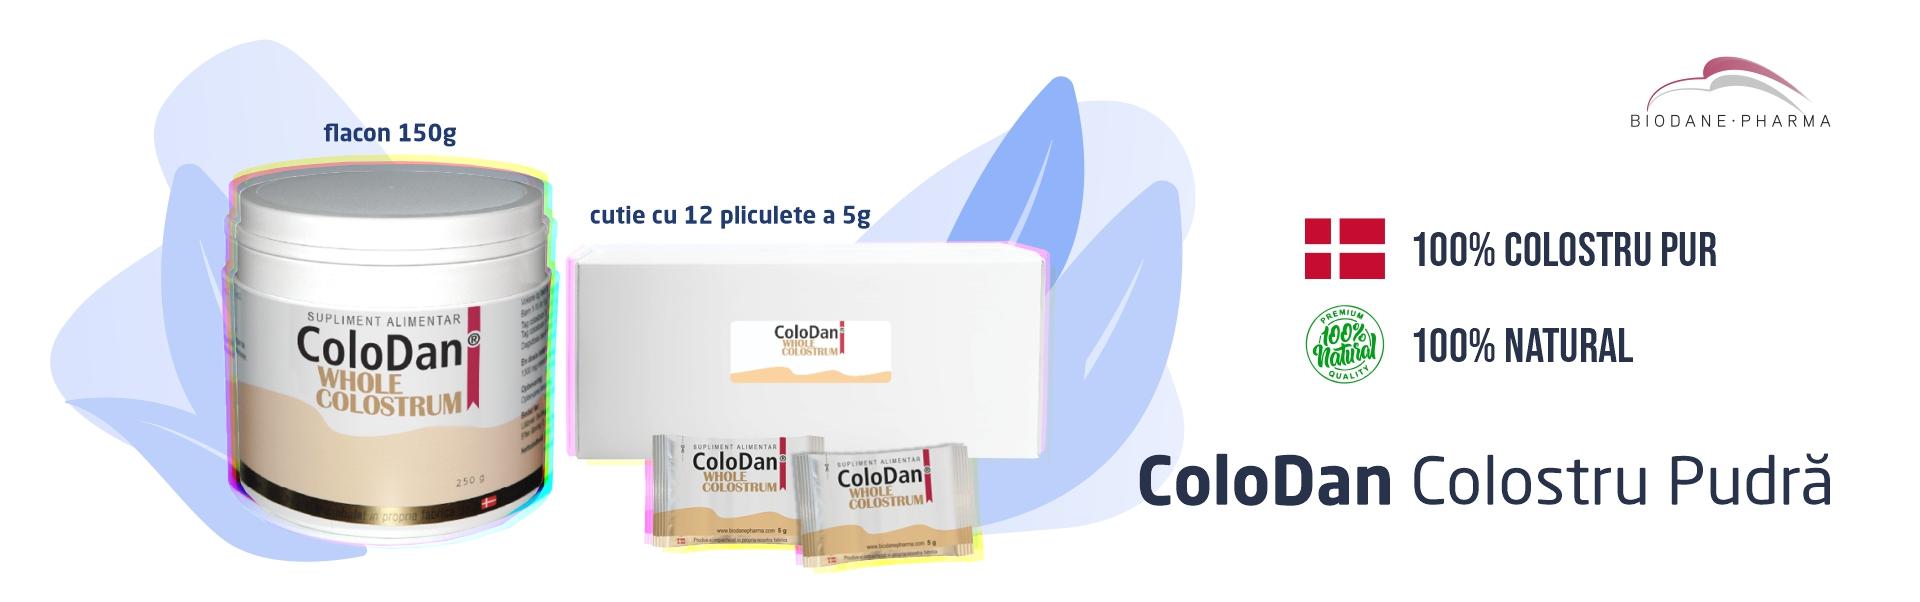 ColoDan